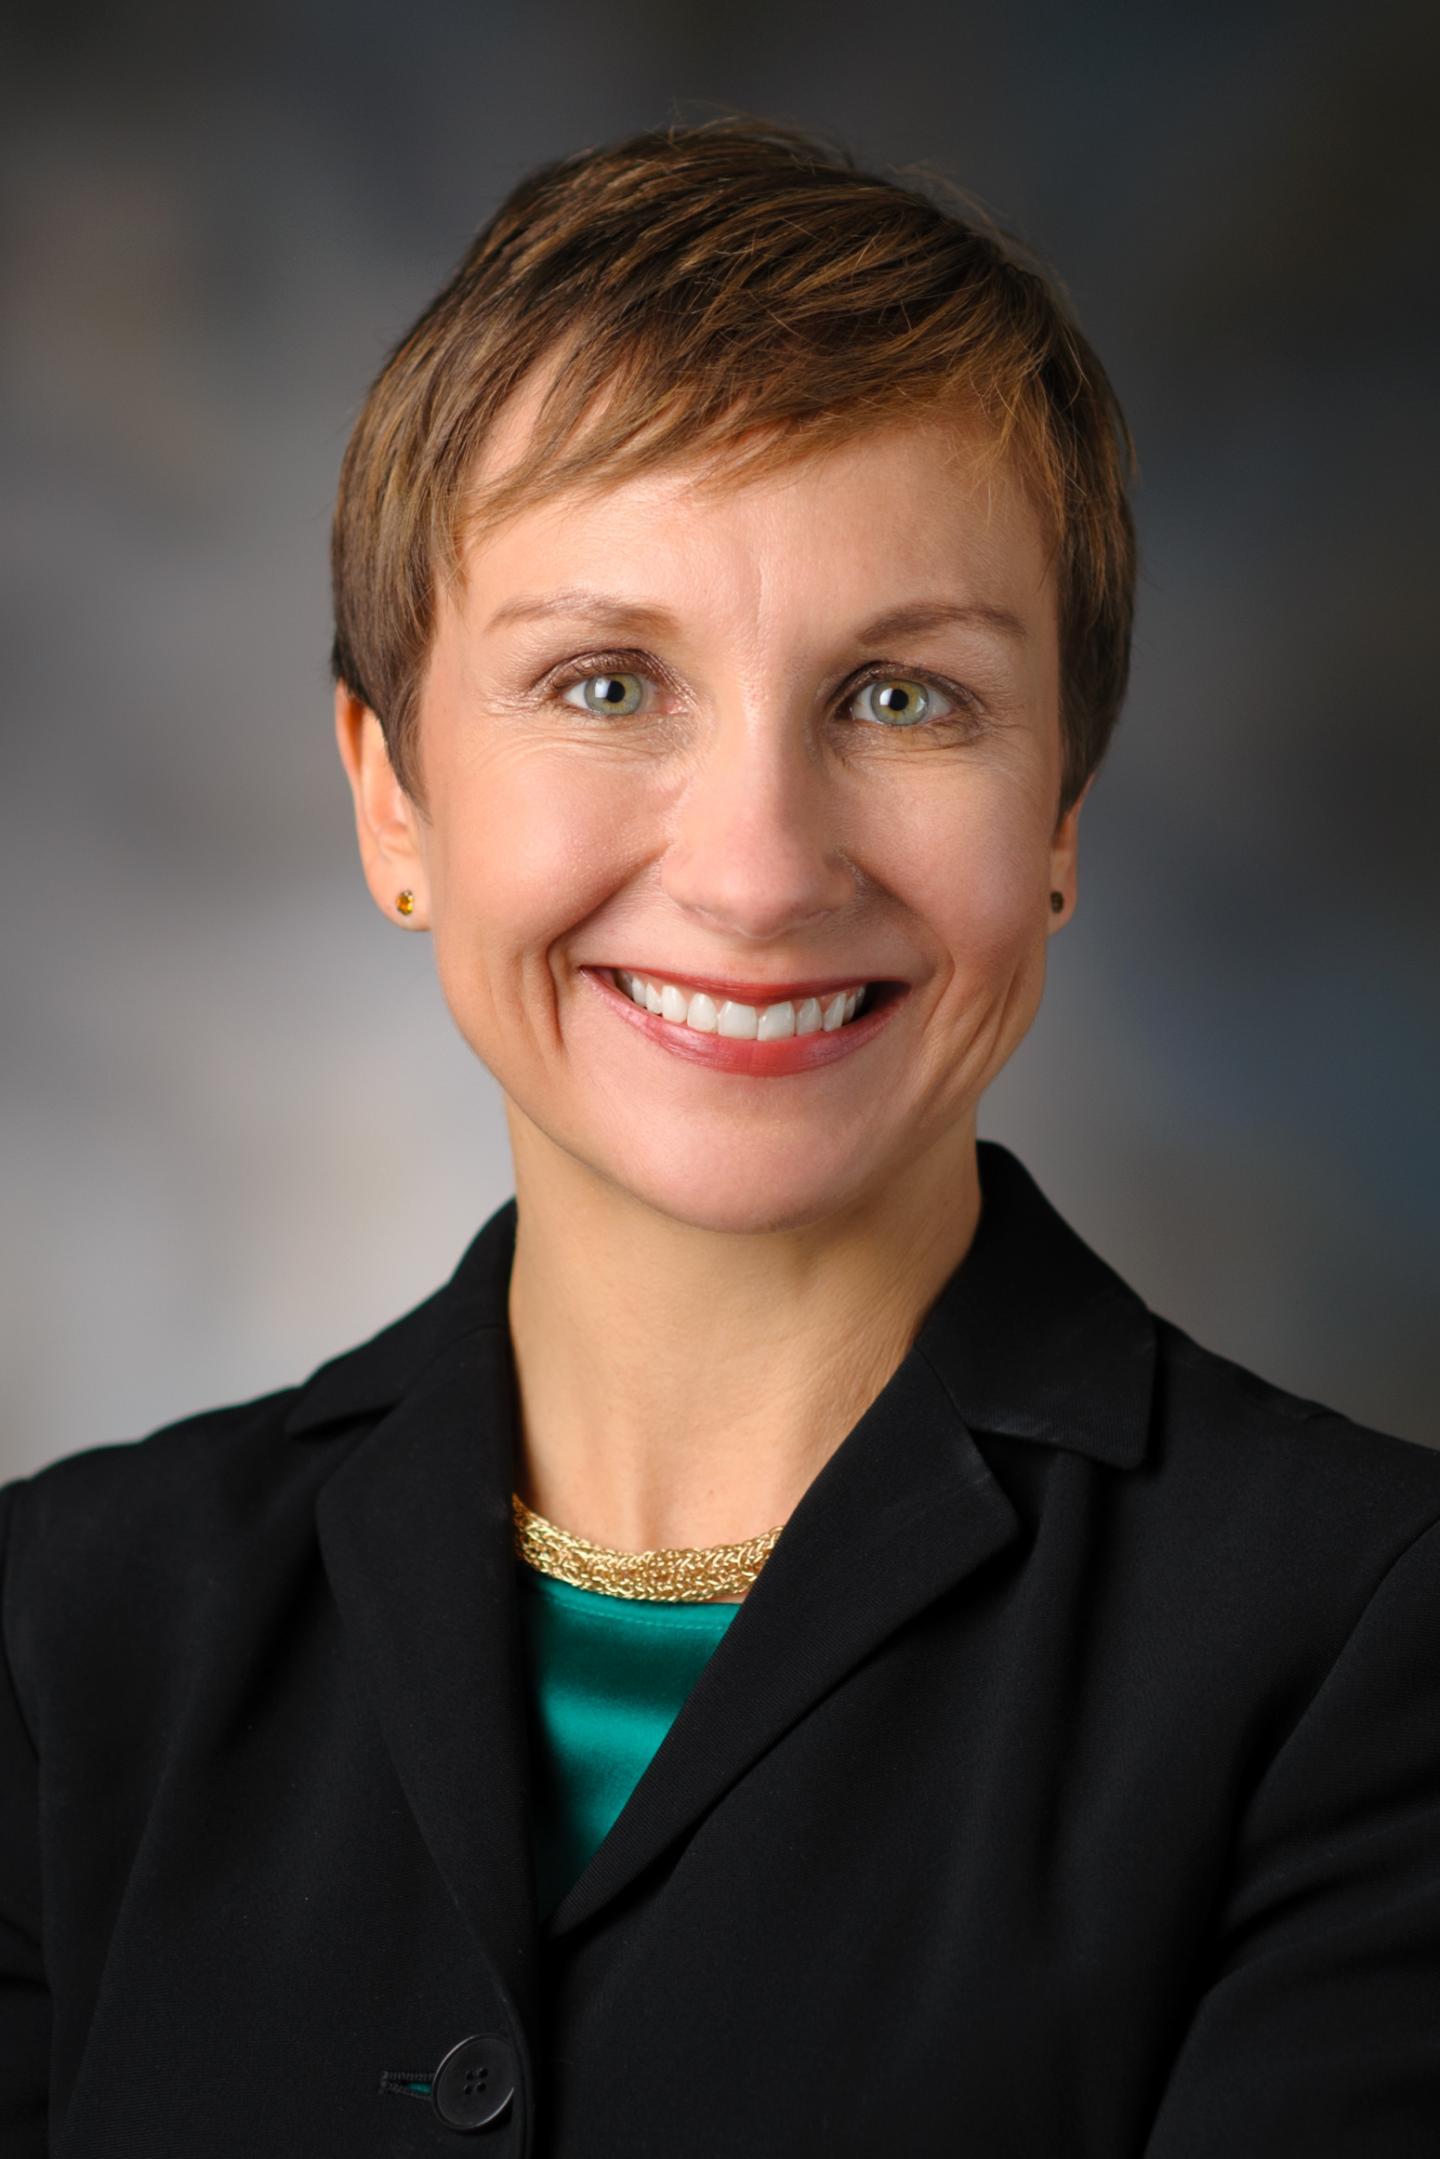 Jennifer McQuade, M.D., University of Texas M. D. Anderson Cancer Center